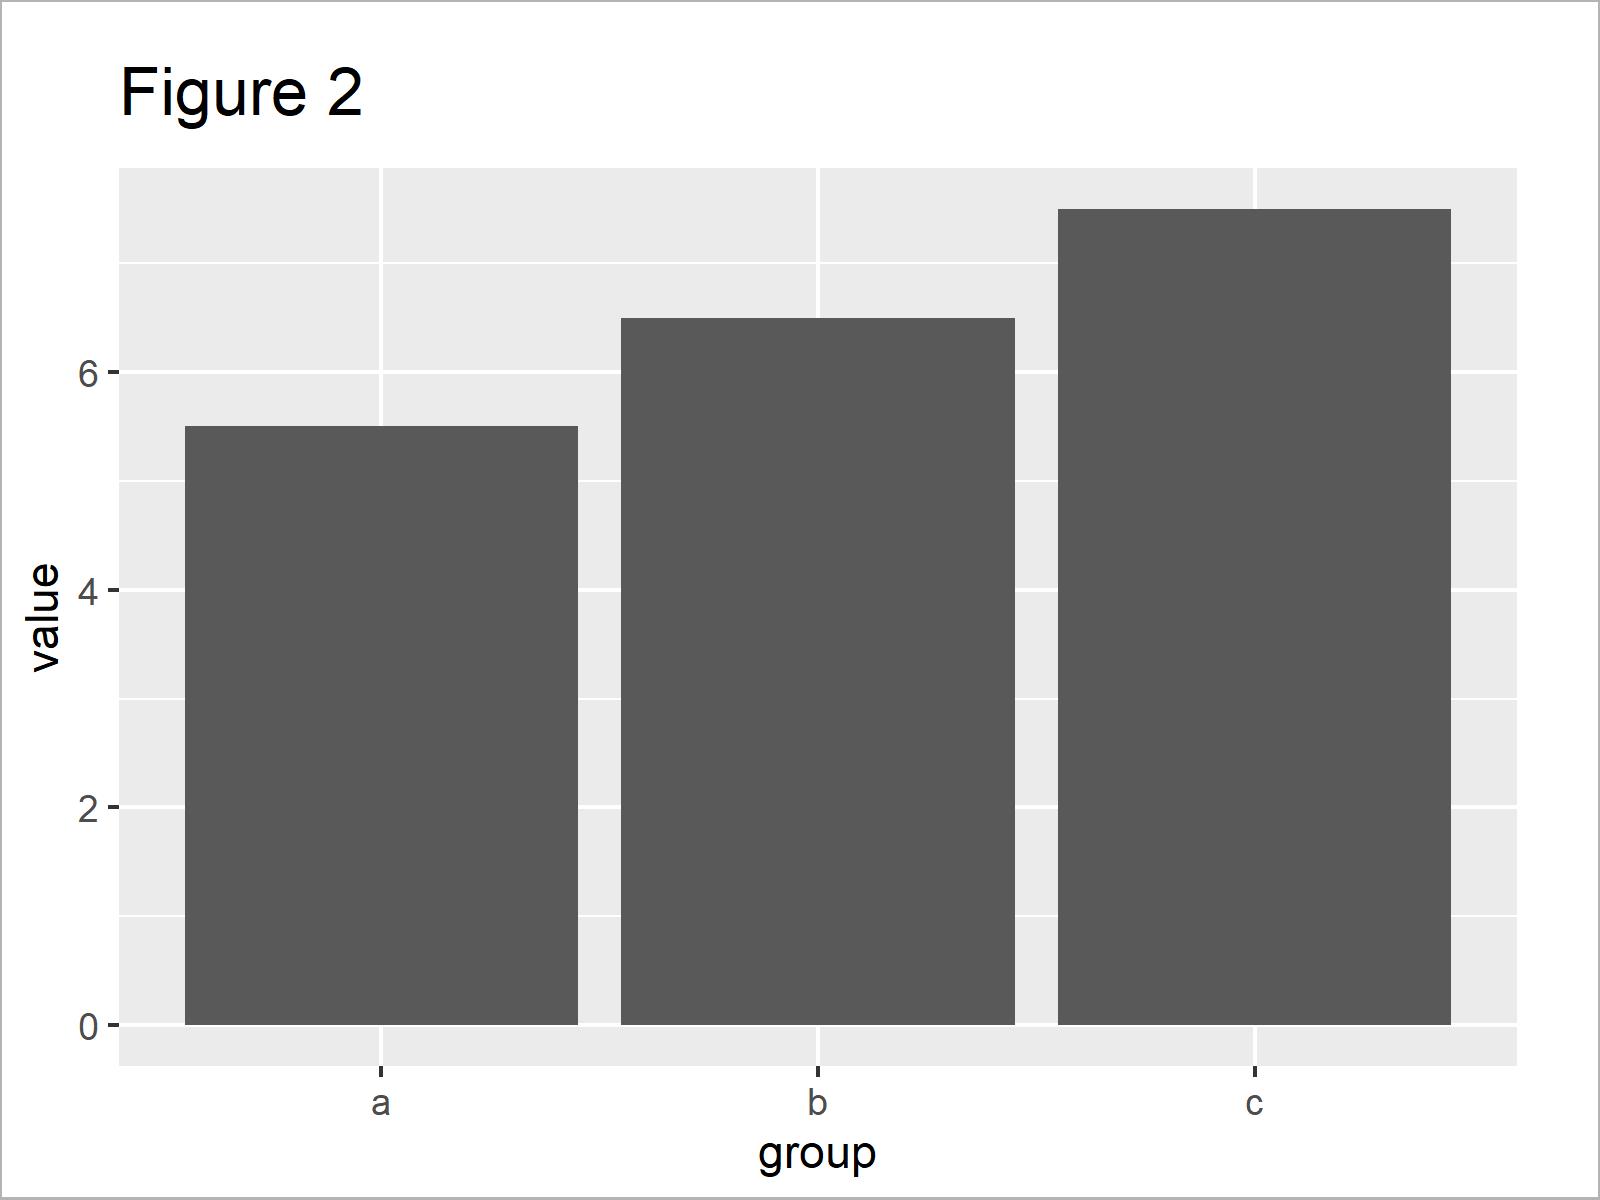 r graph figure 2 plot mean ggplot2 barplot